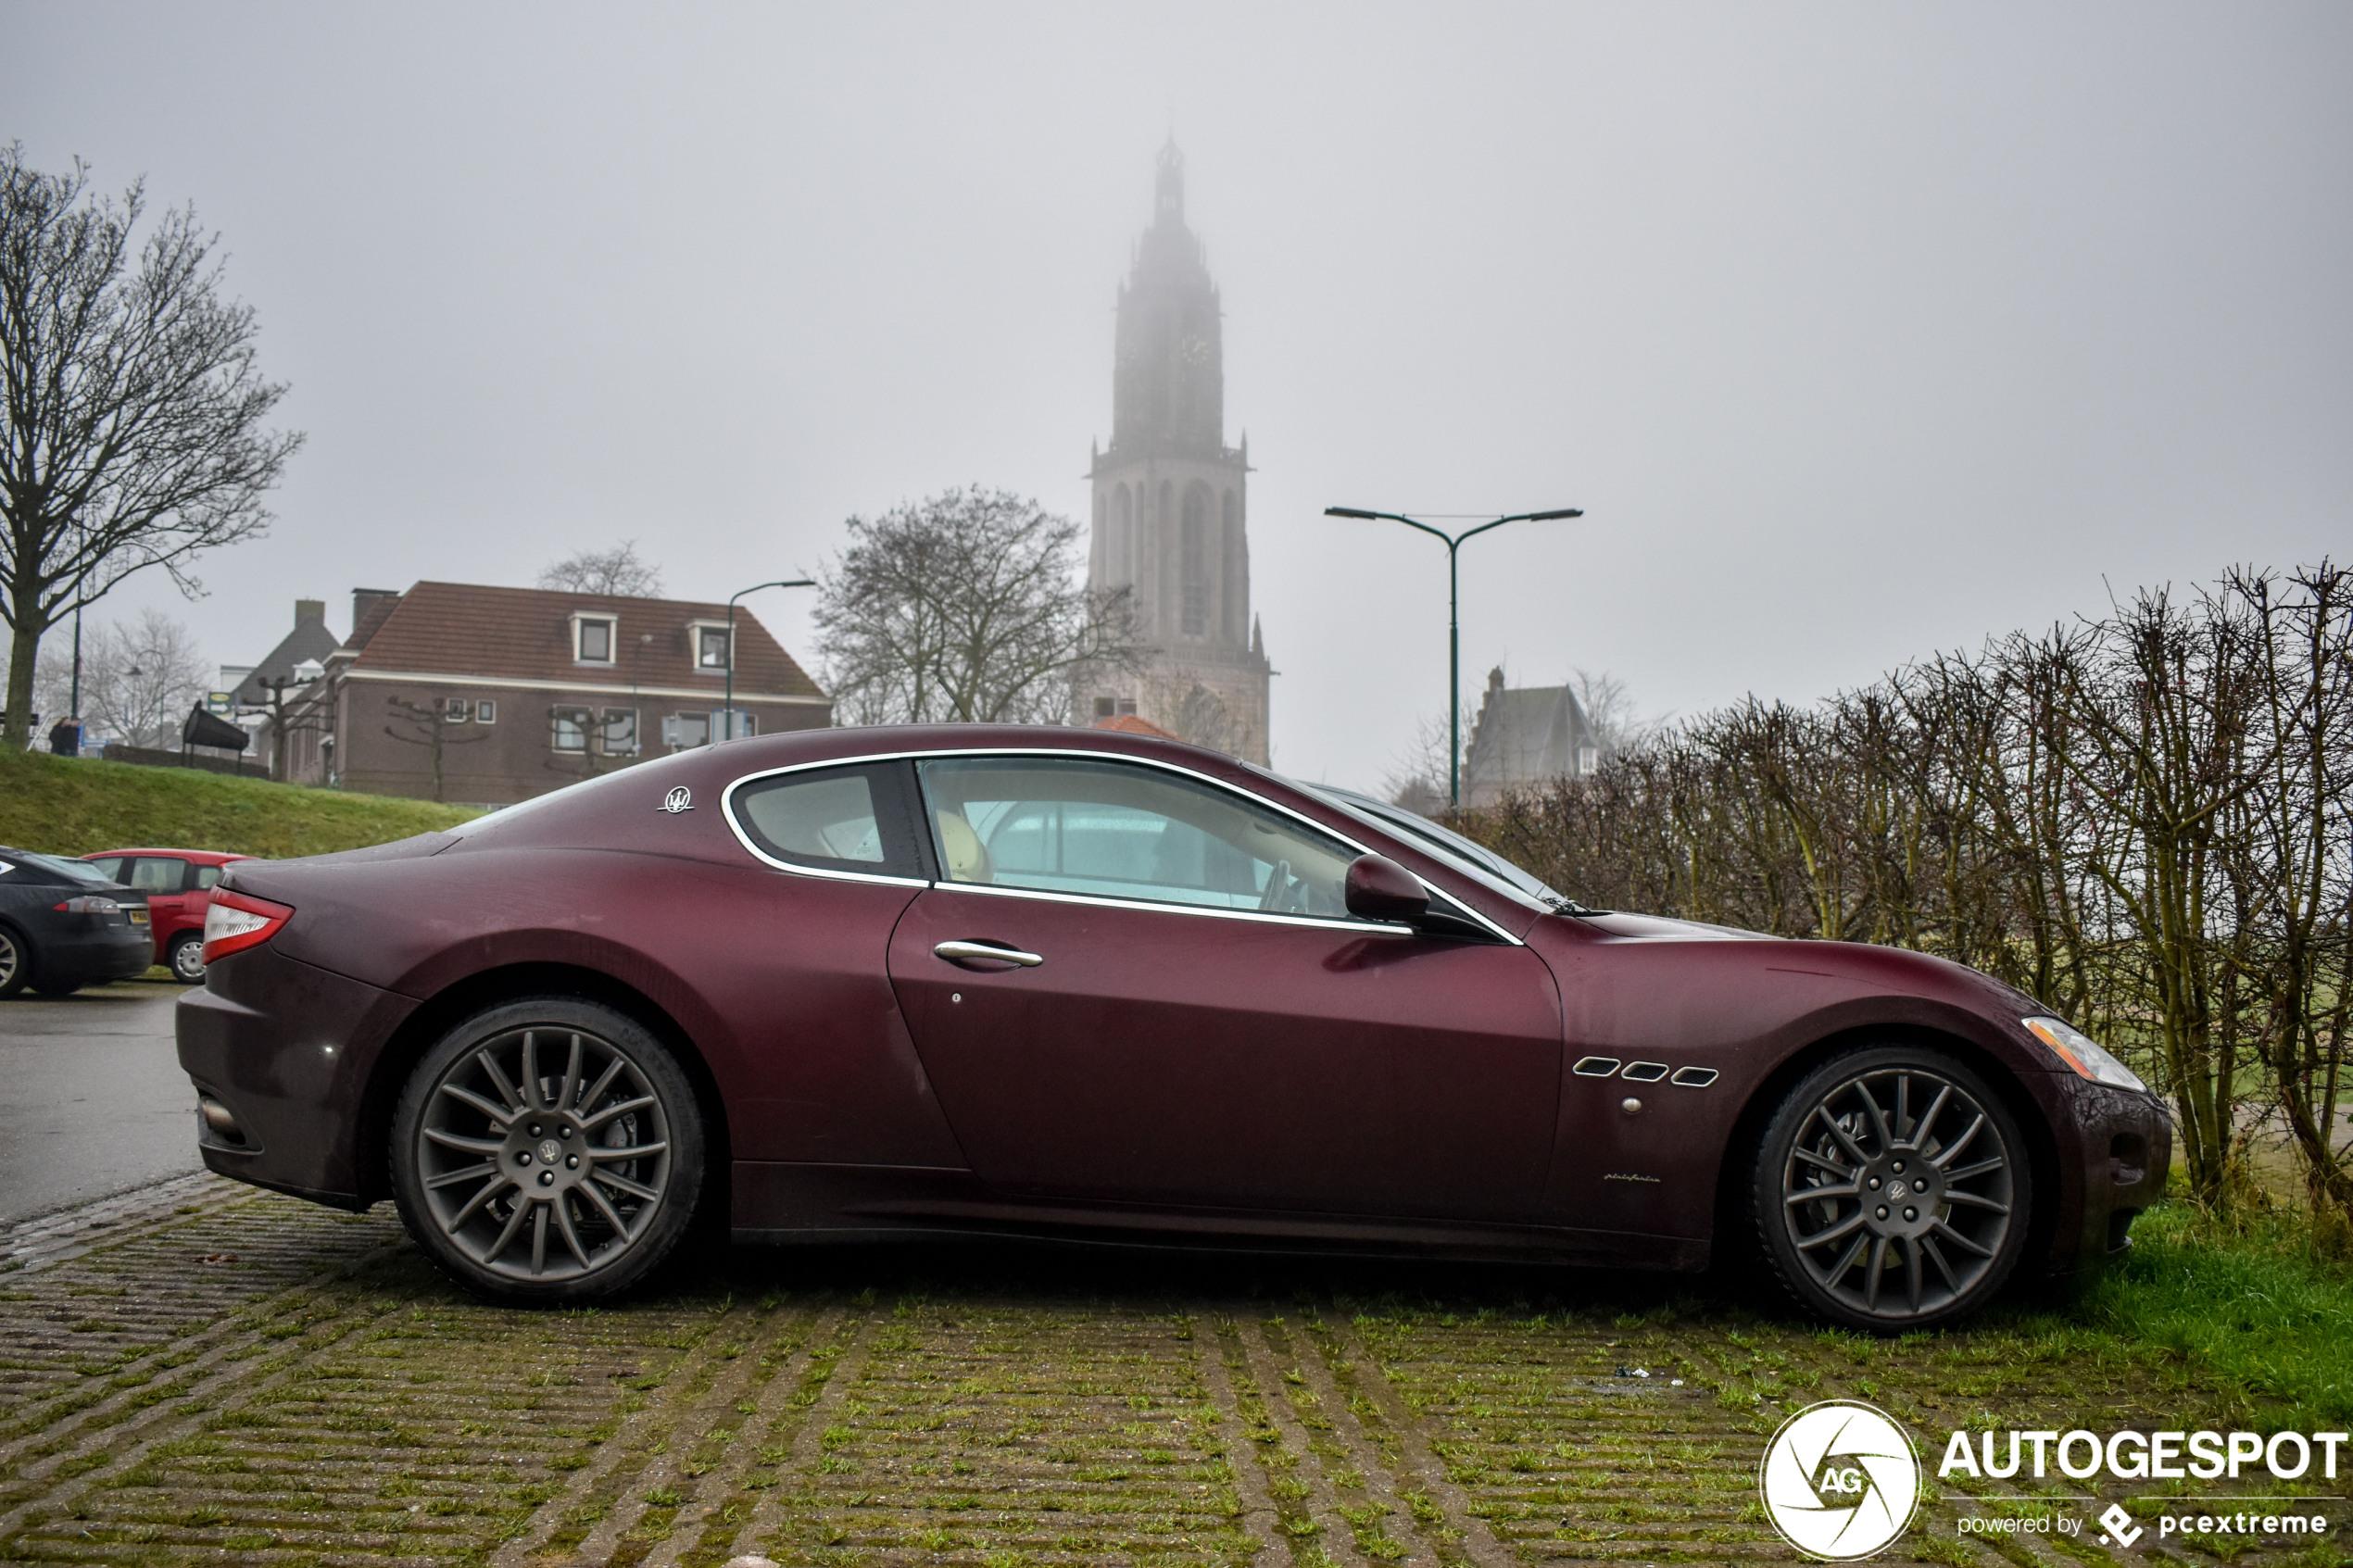 Spot van de dag: Maserati GranTurismo S